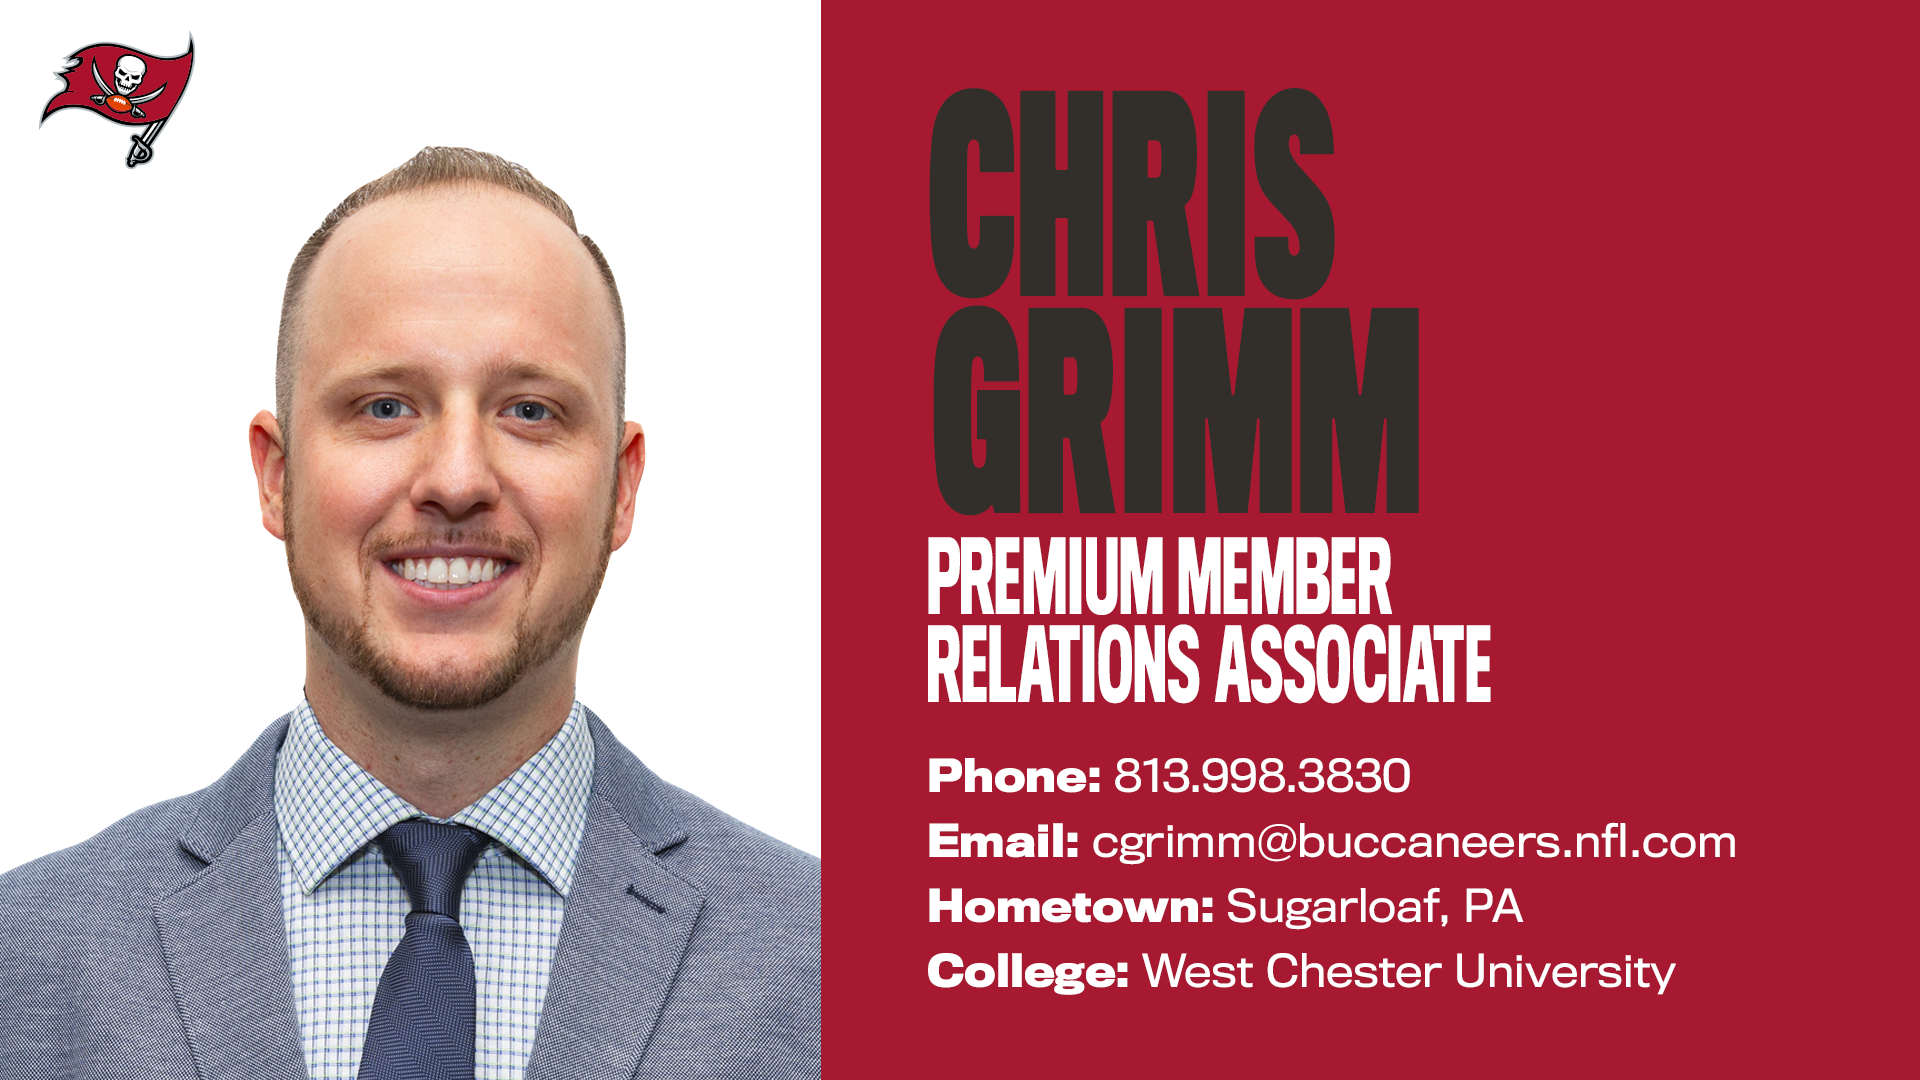 Chris Grimm